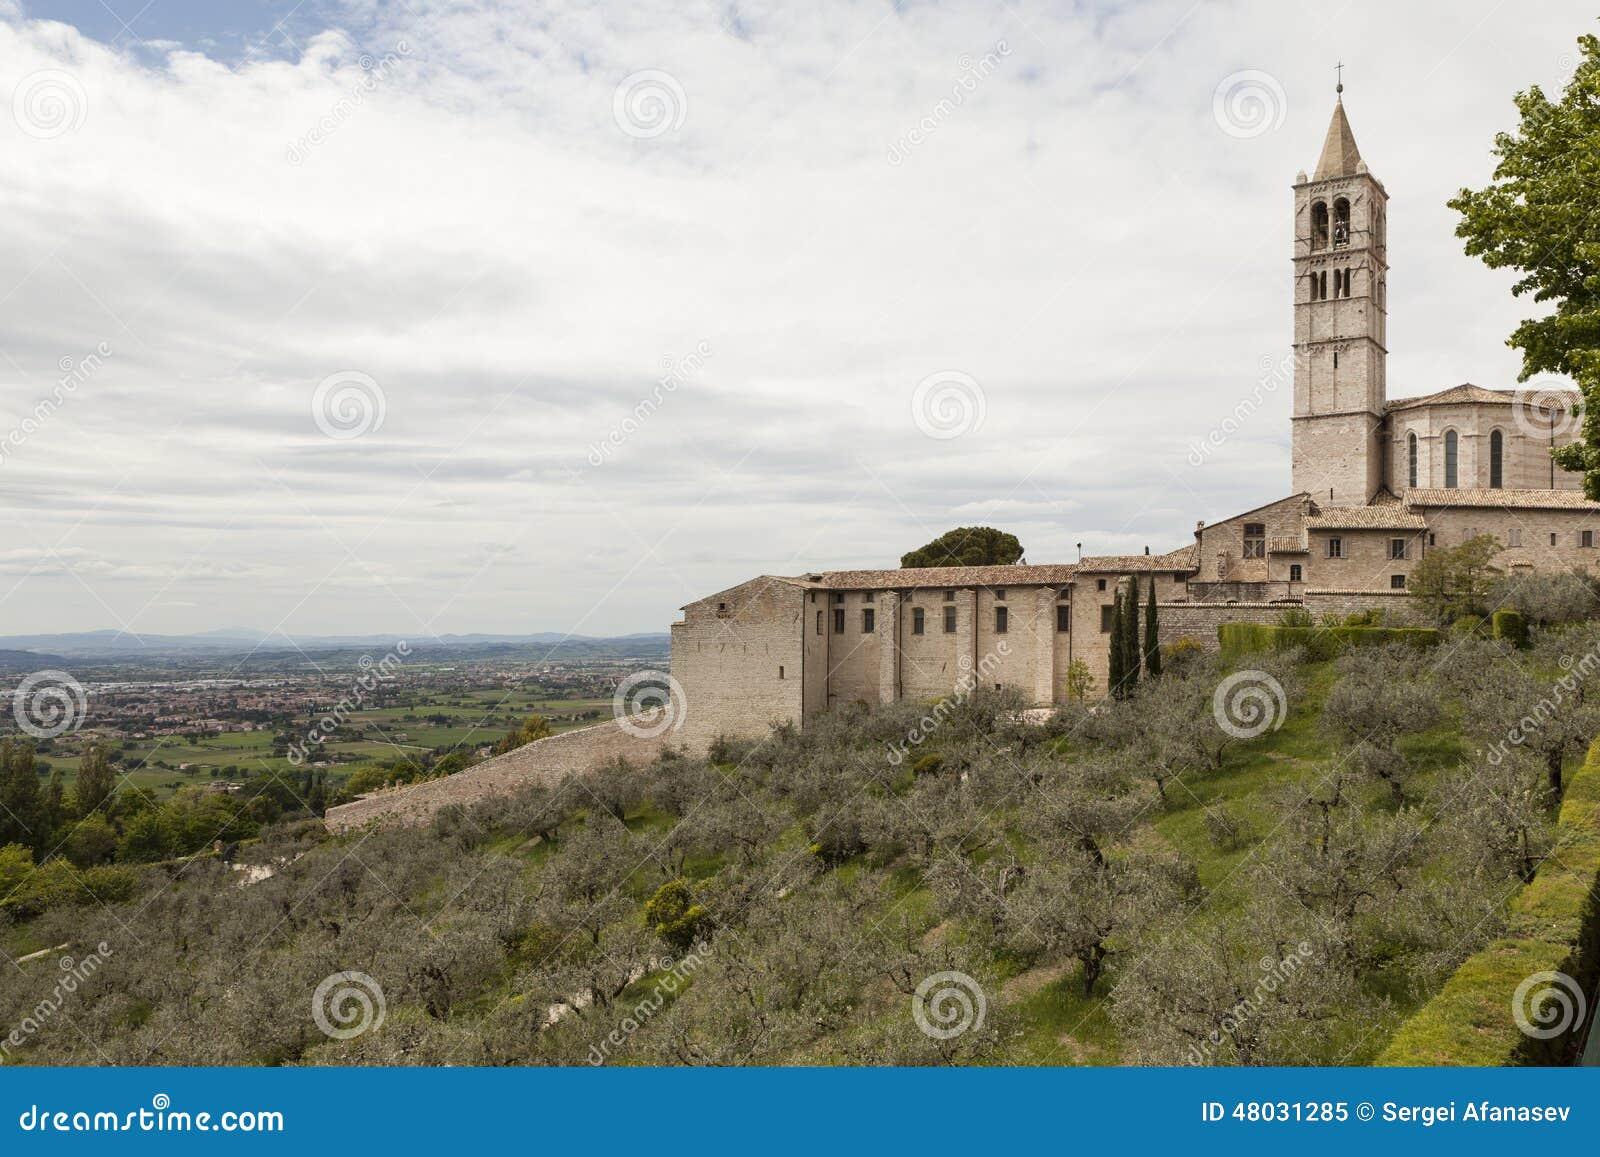 Map Of Gubbio Umbria Italy Stock Image Image Of Panorama